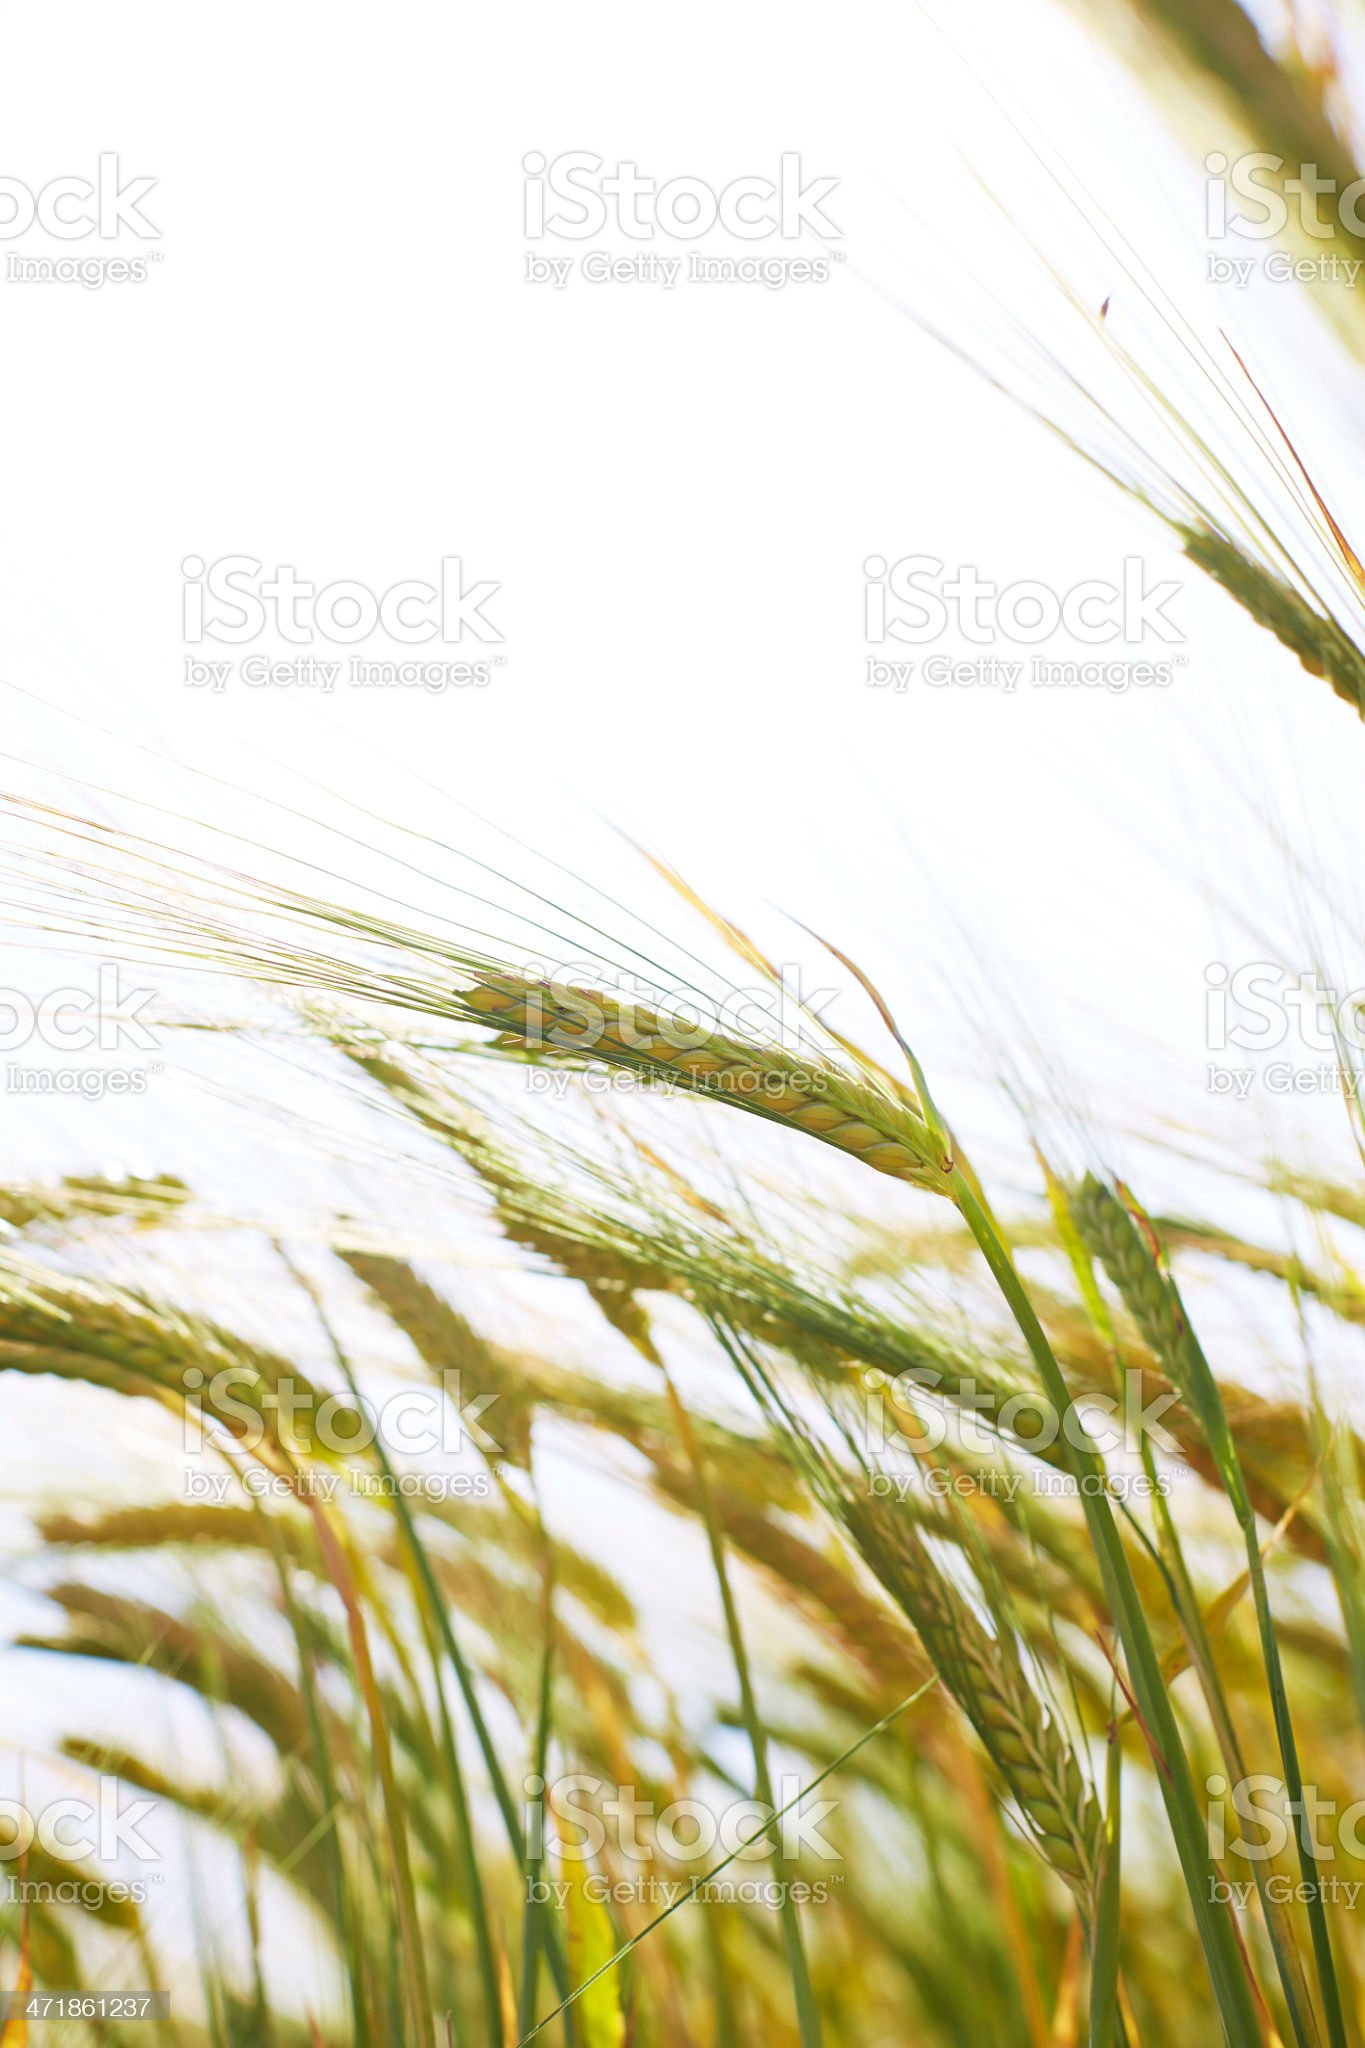 Ears of wheat in field royalty-free stock photo